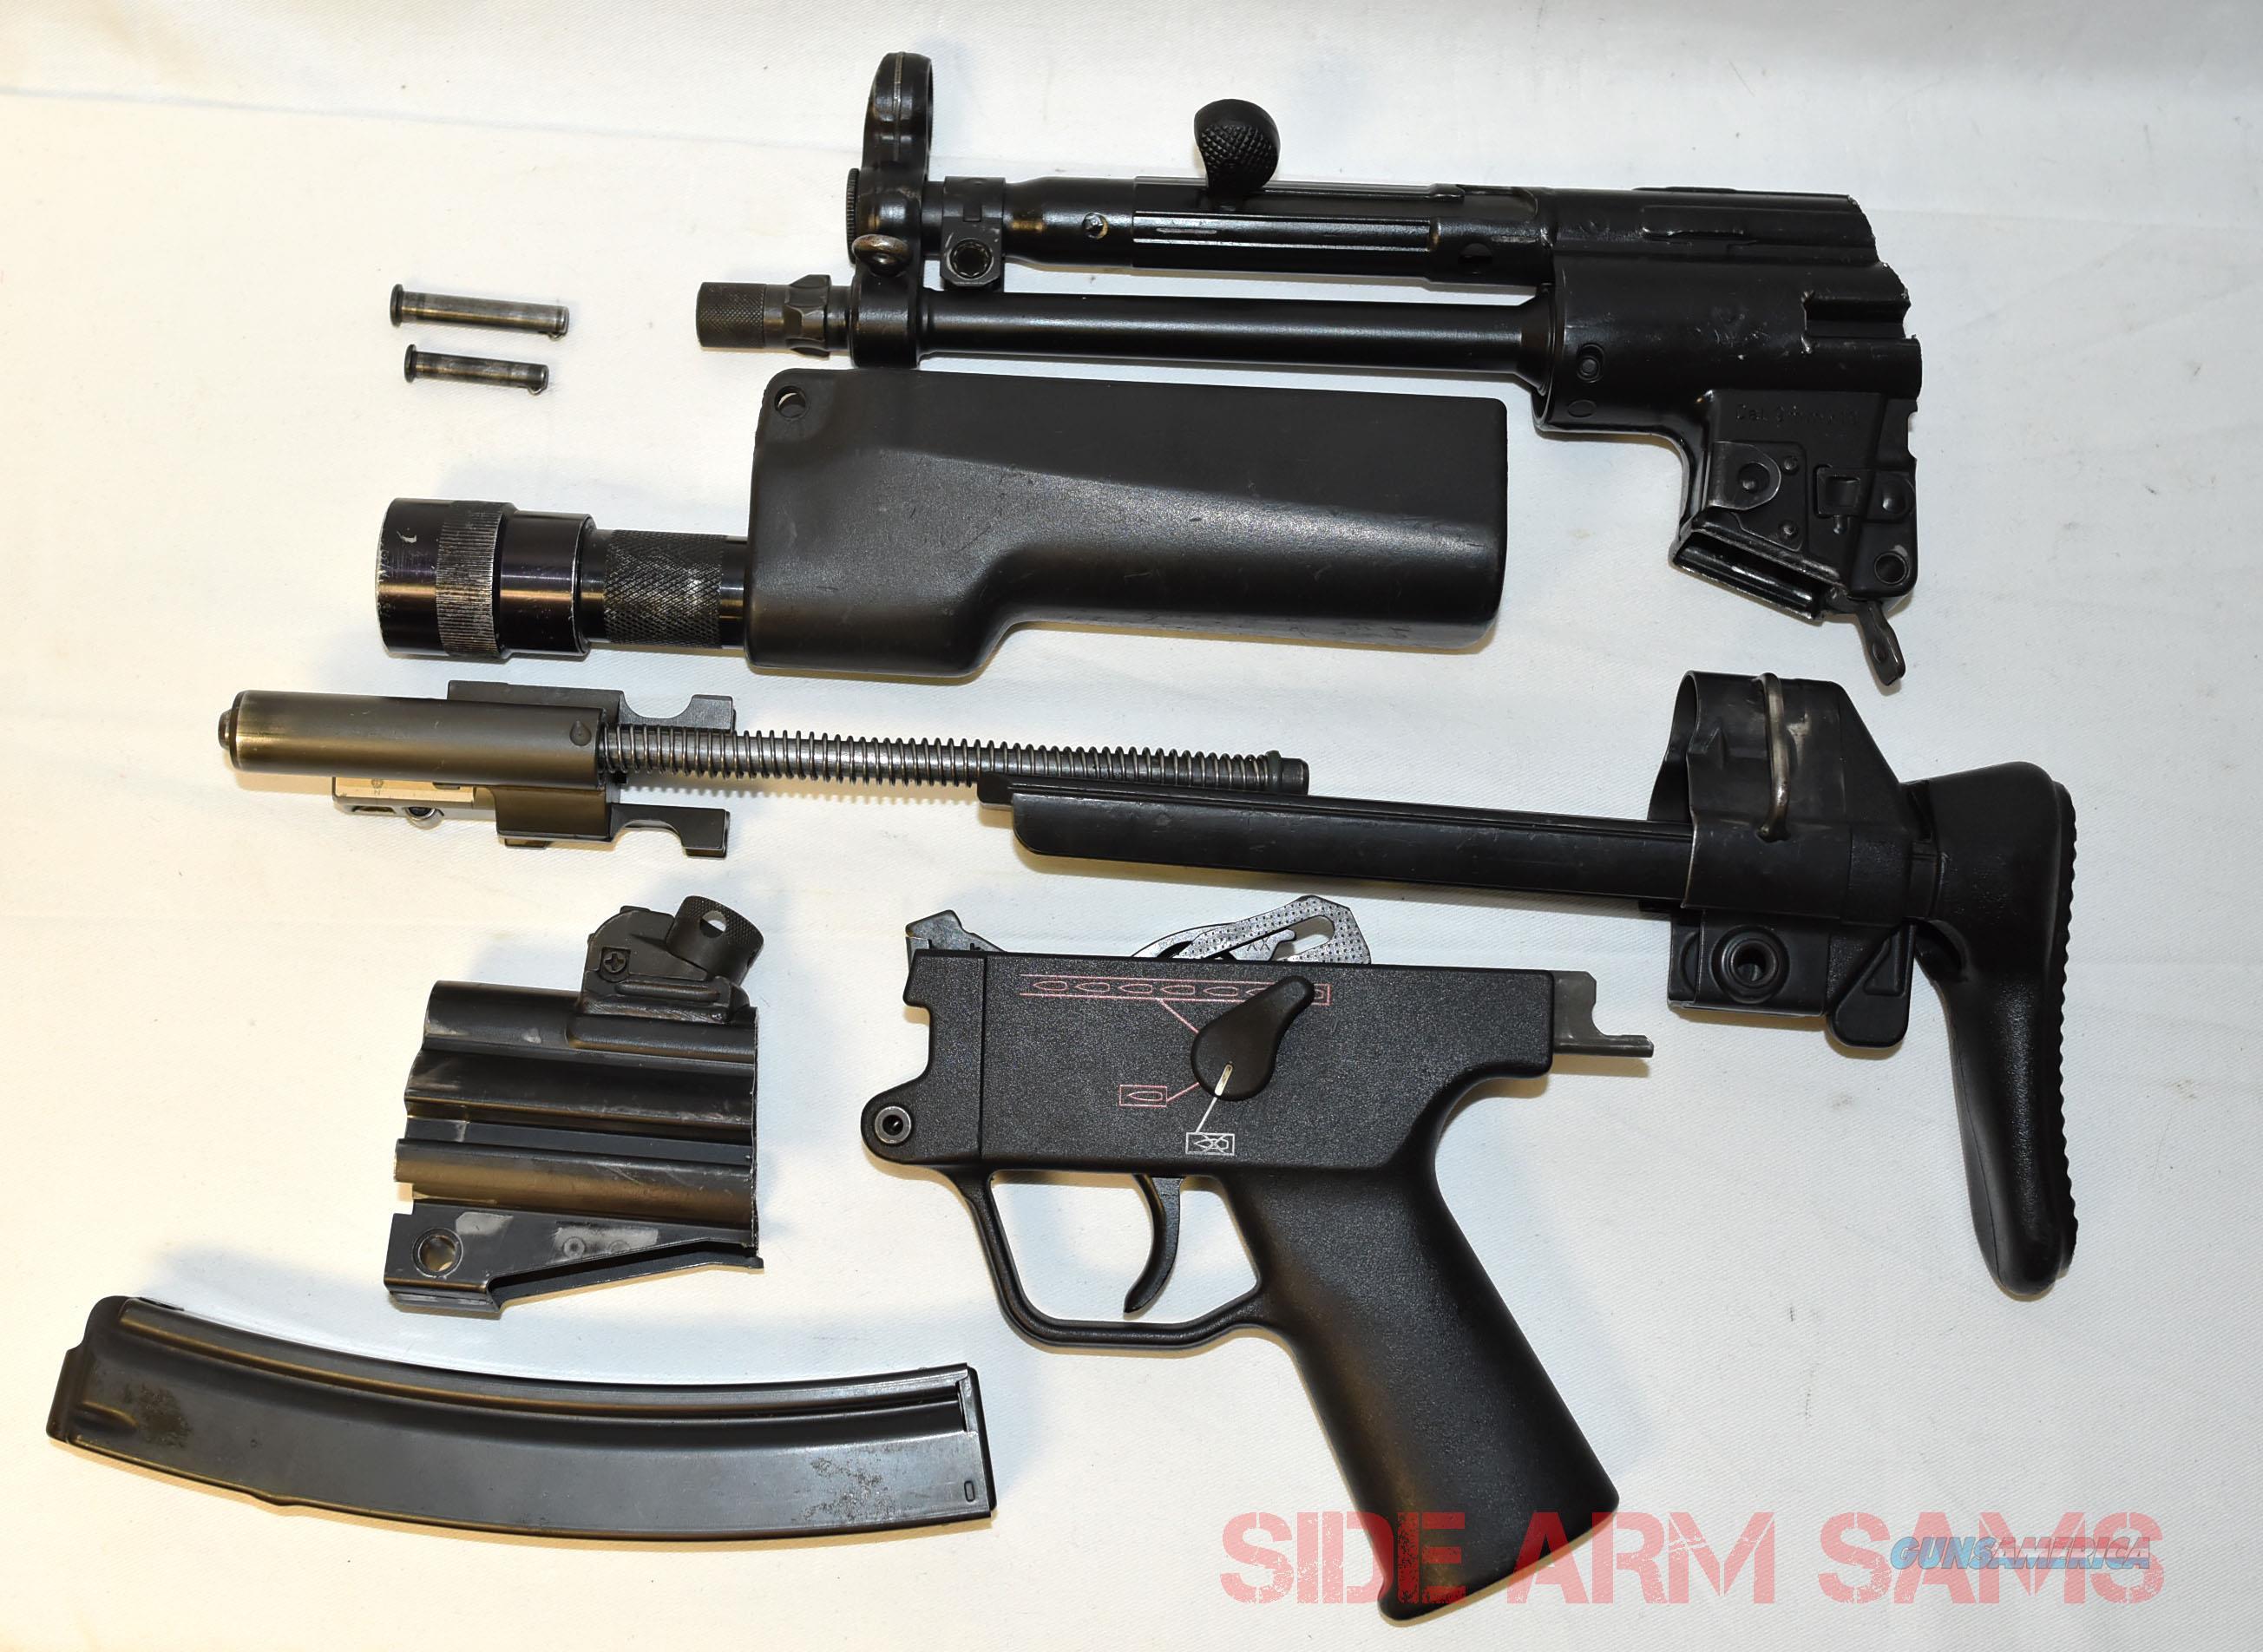 Excellent Complete German HK-MP5A3 NAVY Saw-Cut Parts Kit  Non-Guns > Military > De-Milled Weapons